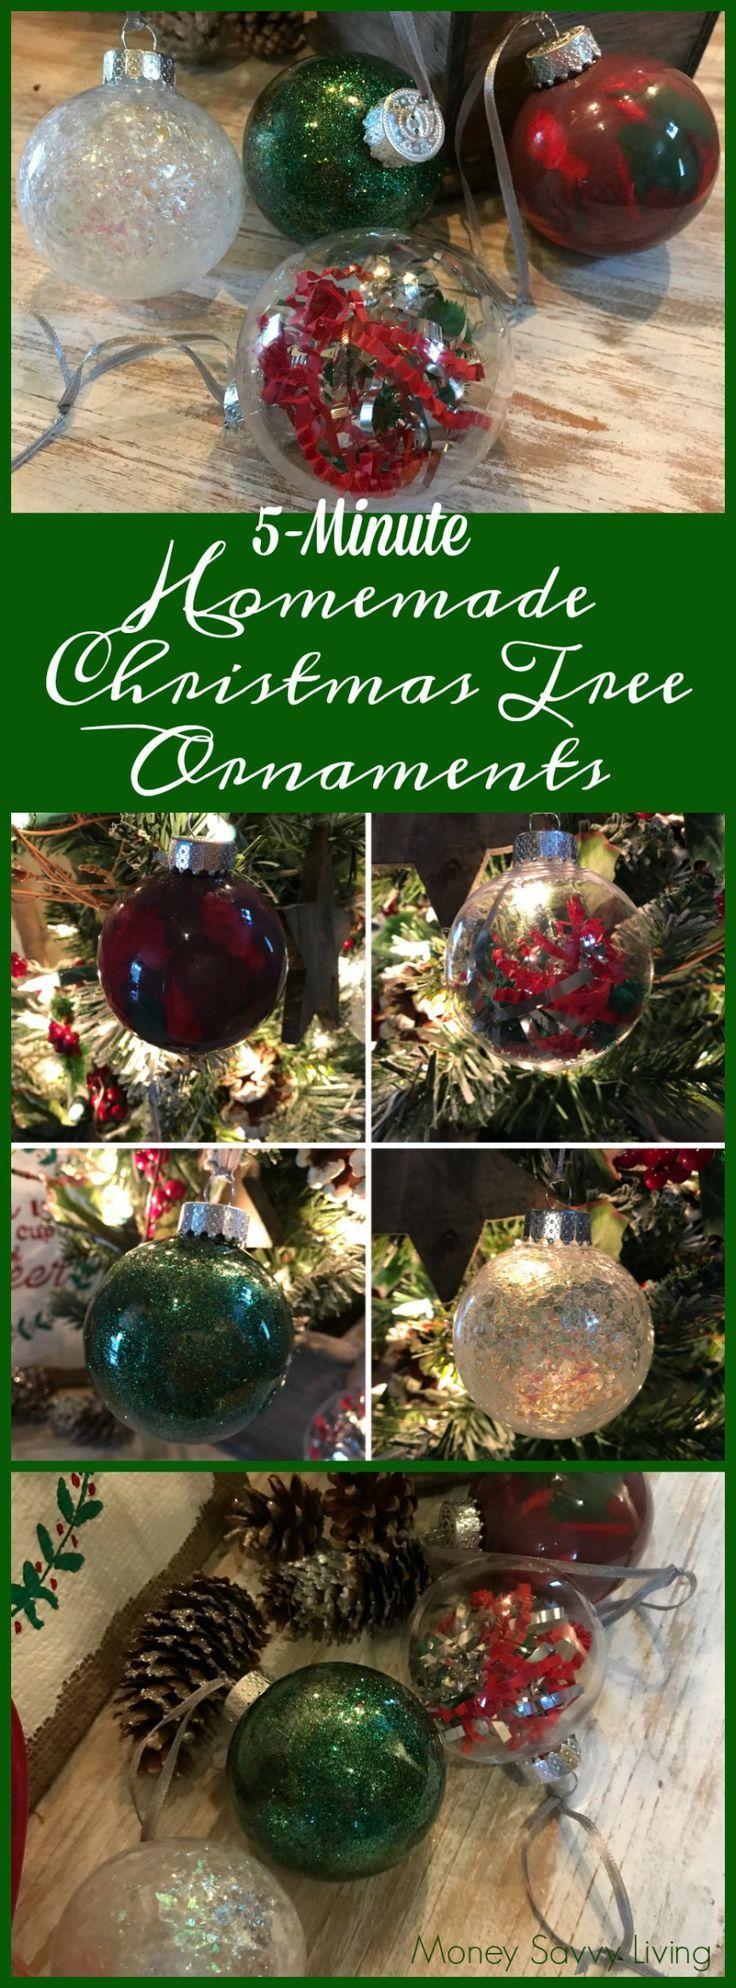 5-Minute Homemade Christmas Tree Ornaments // Money Savvy Living #christmas #christmastree #ChristmasOrnament #ornament